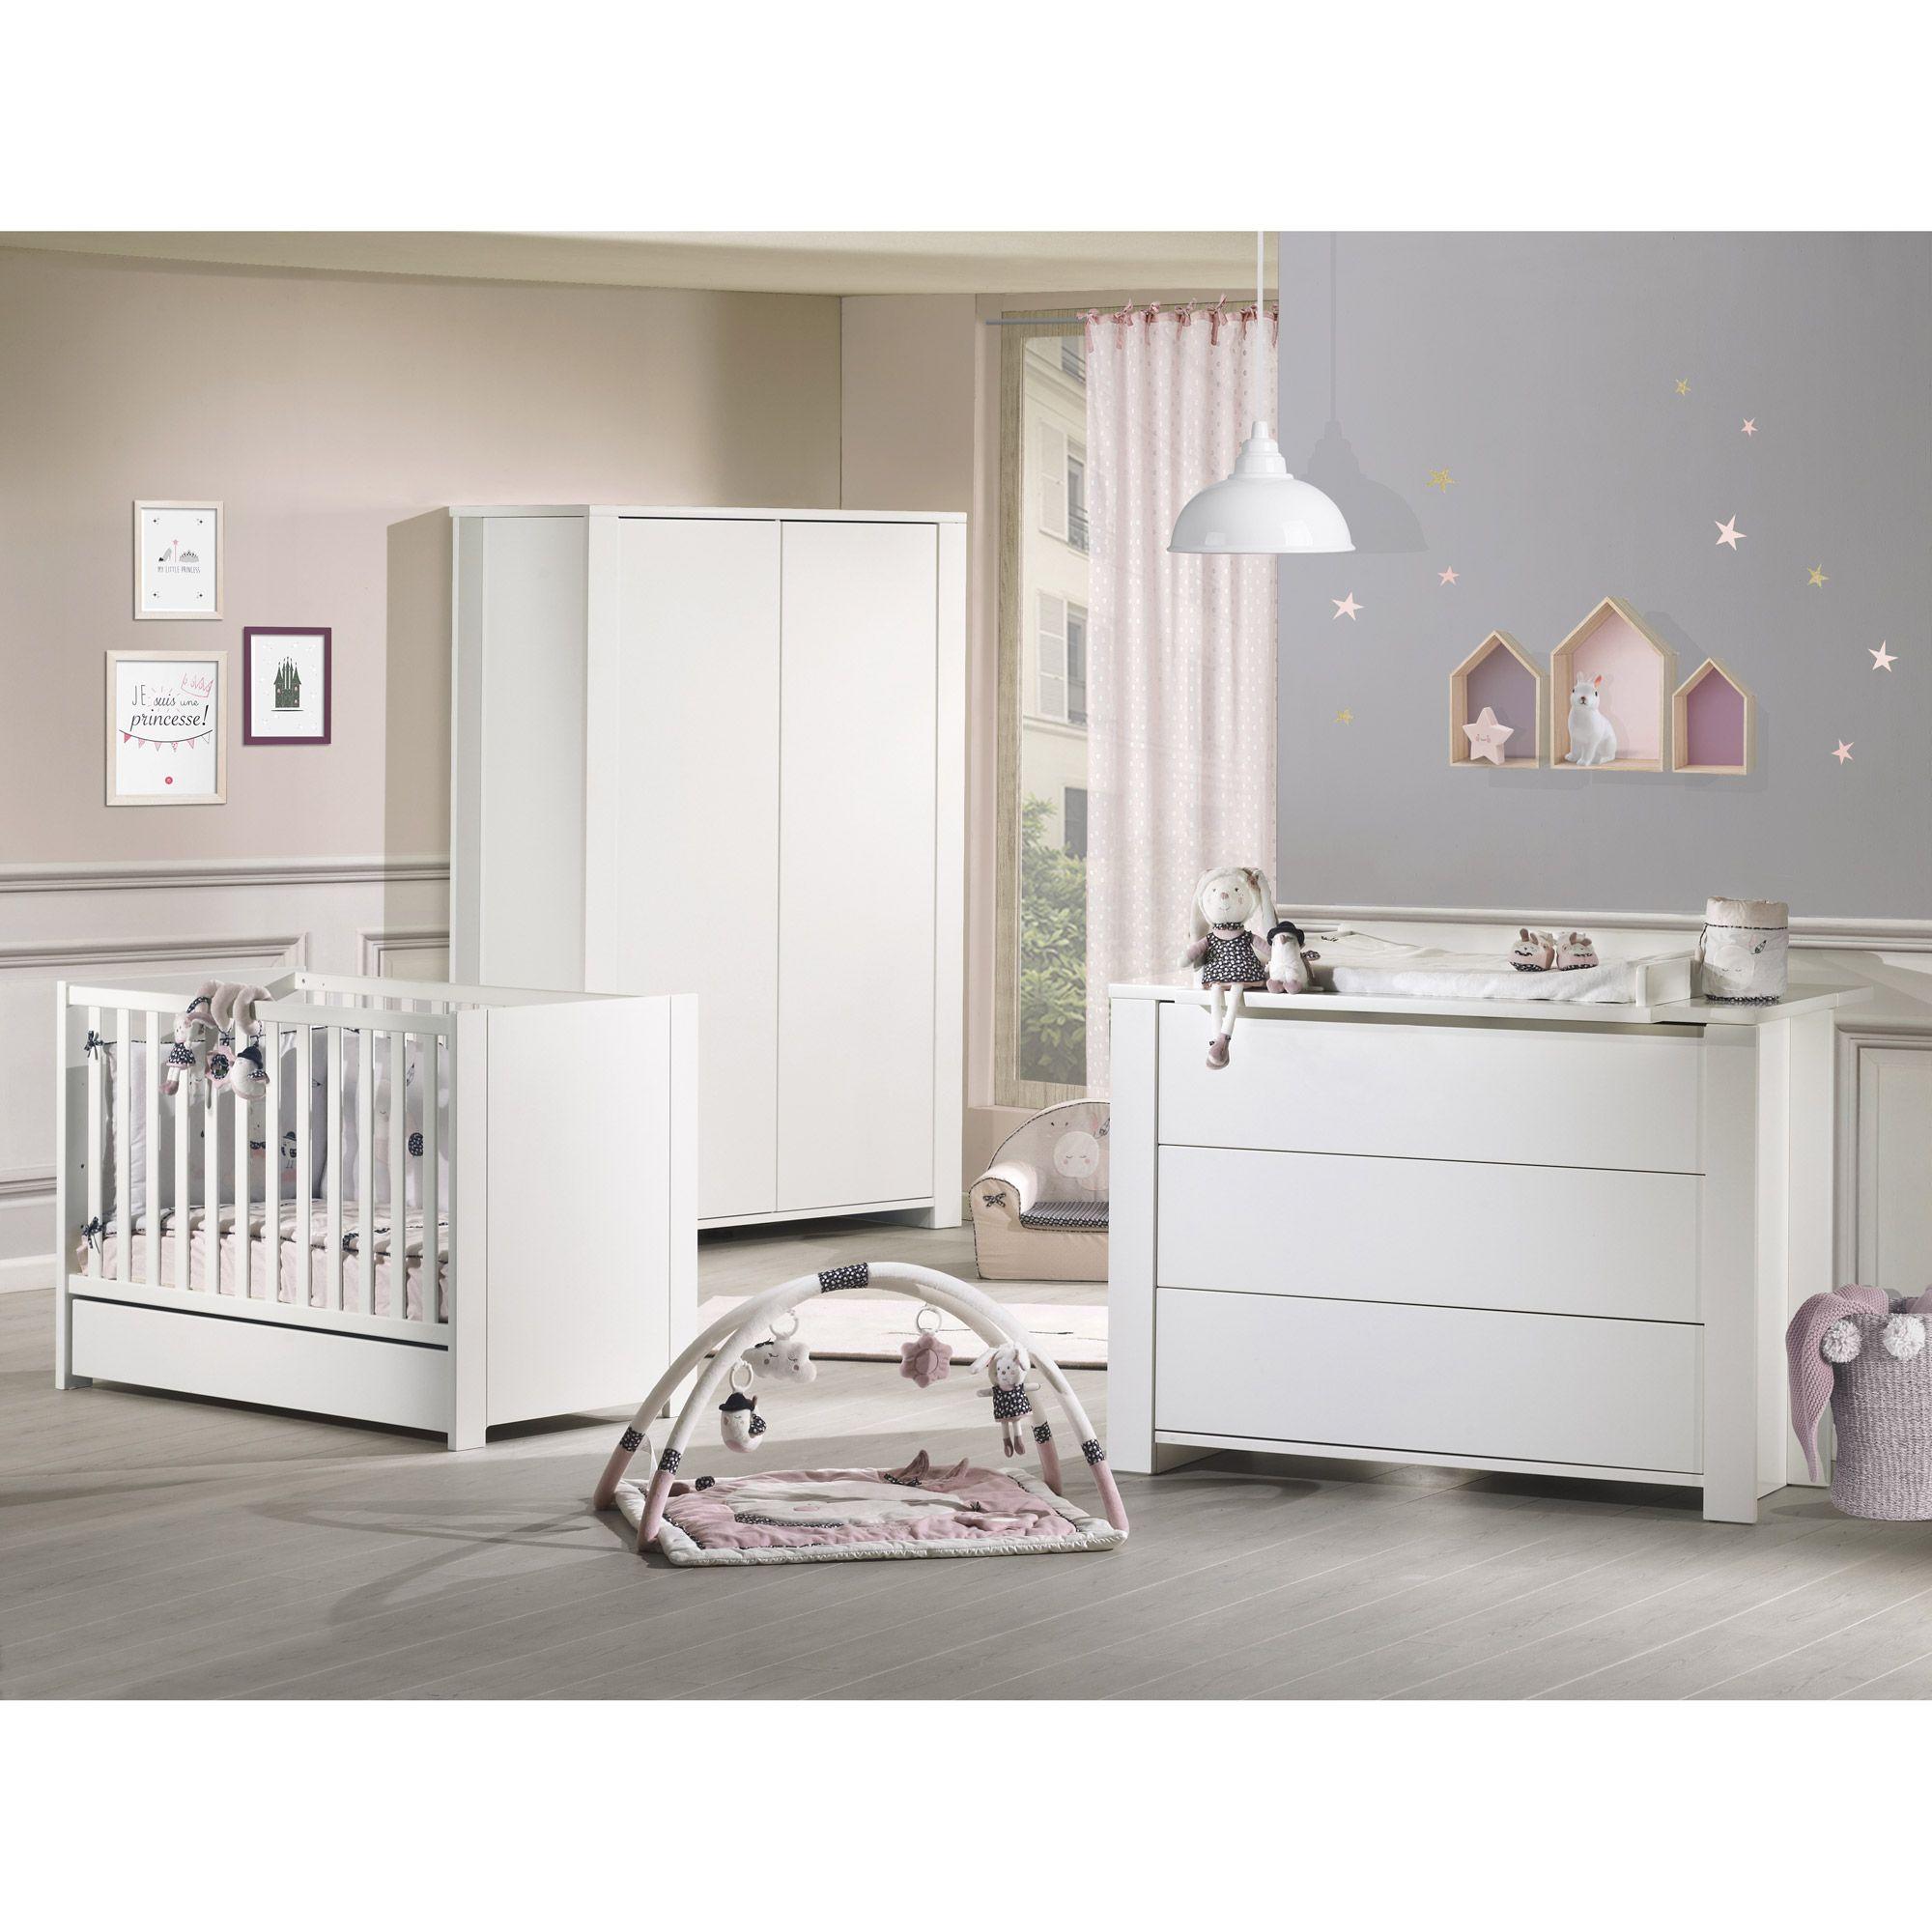 armoire chambre bebe lit bebe